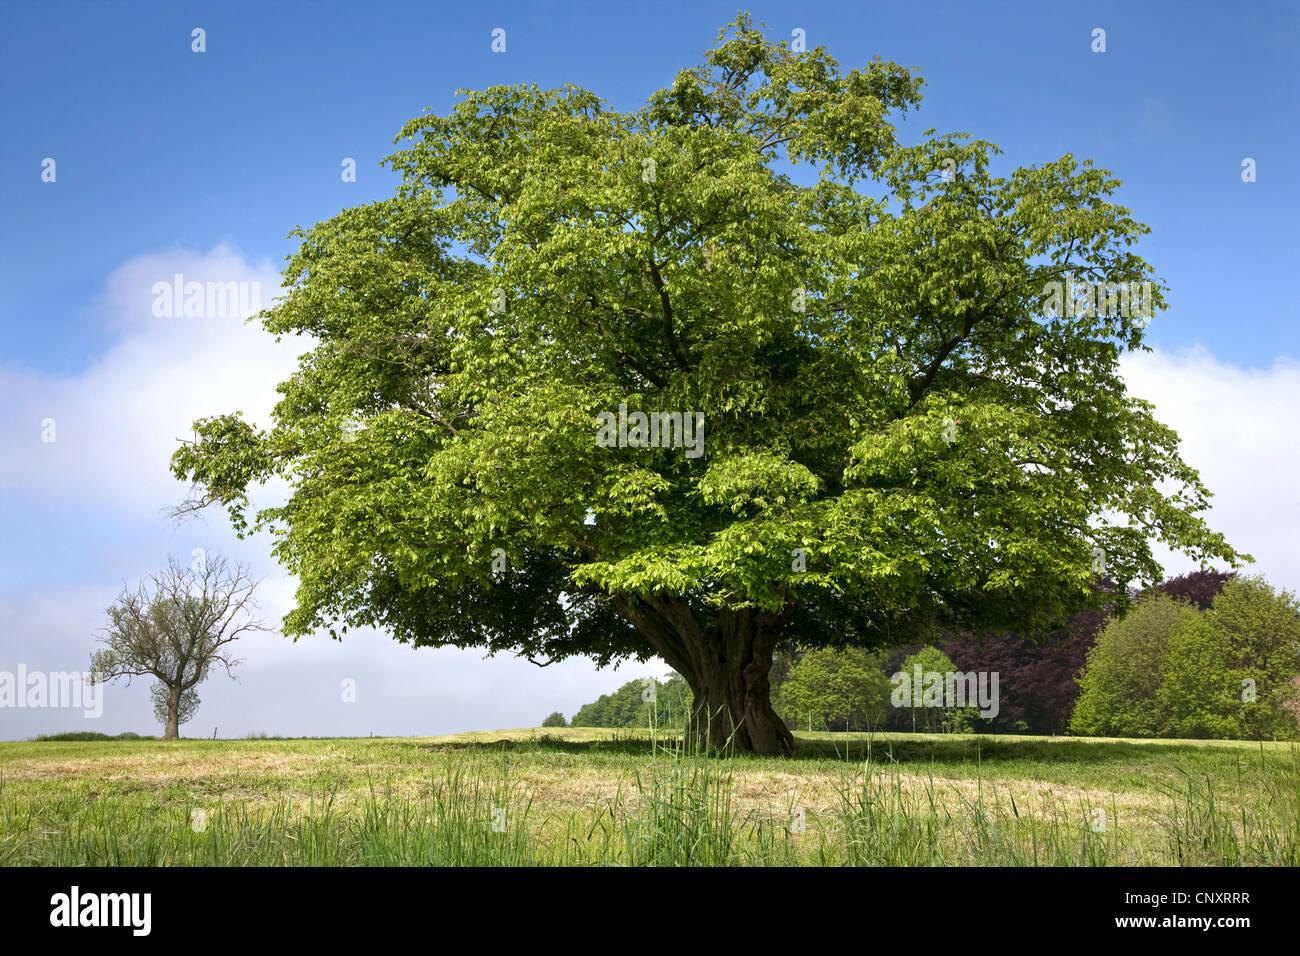 Solitary European hornbeam (Carpinus betulus) tree in meadow in spring, Belgium - Stock Image